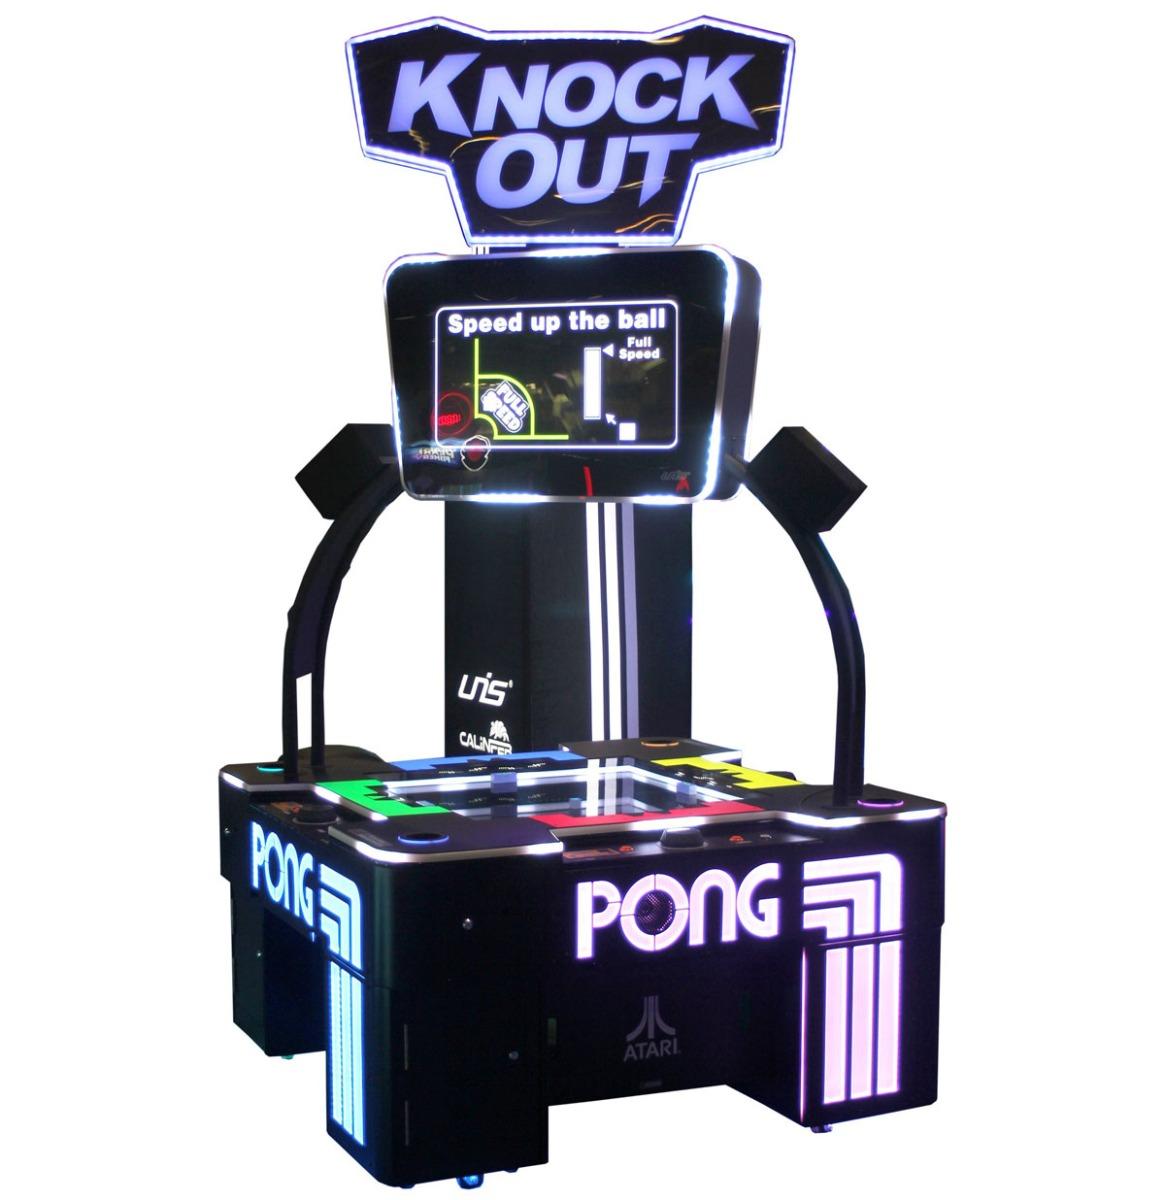 Atari Pong Knock Out Arcade Machine